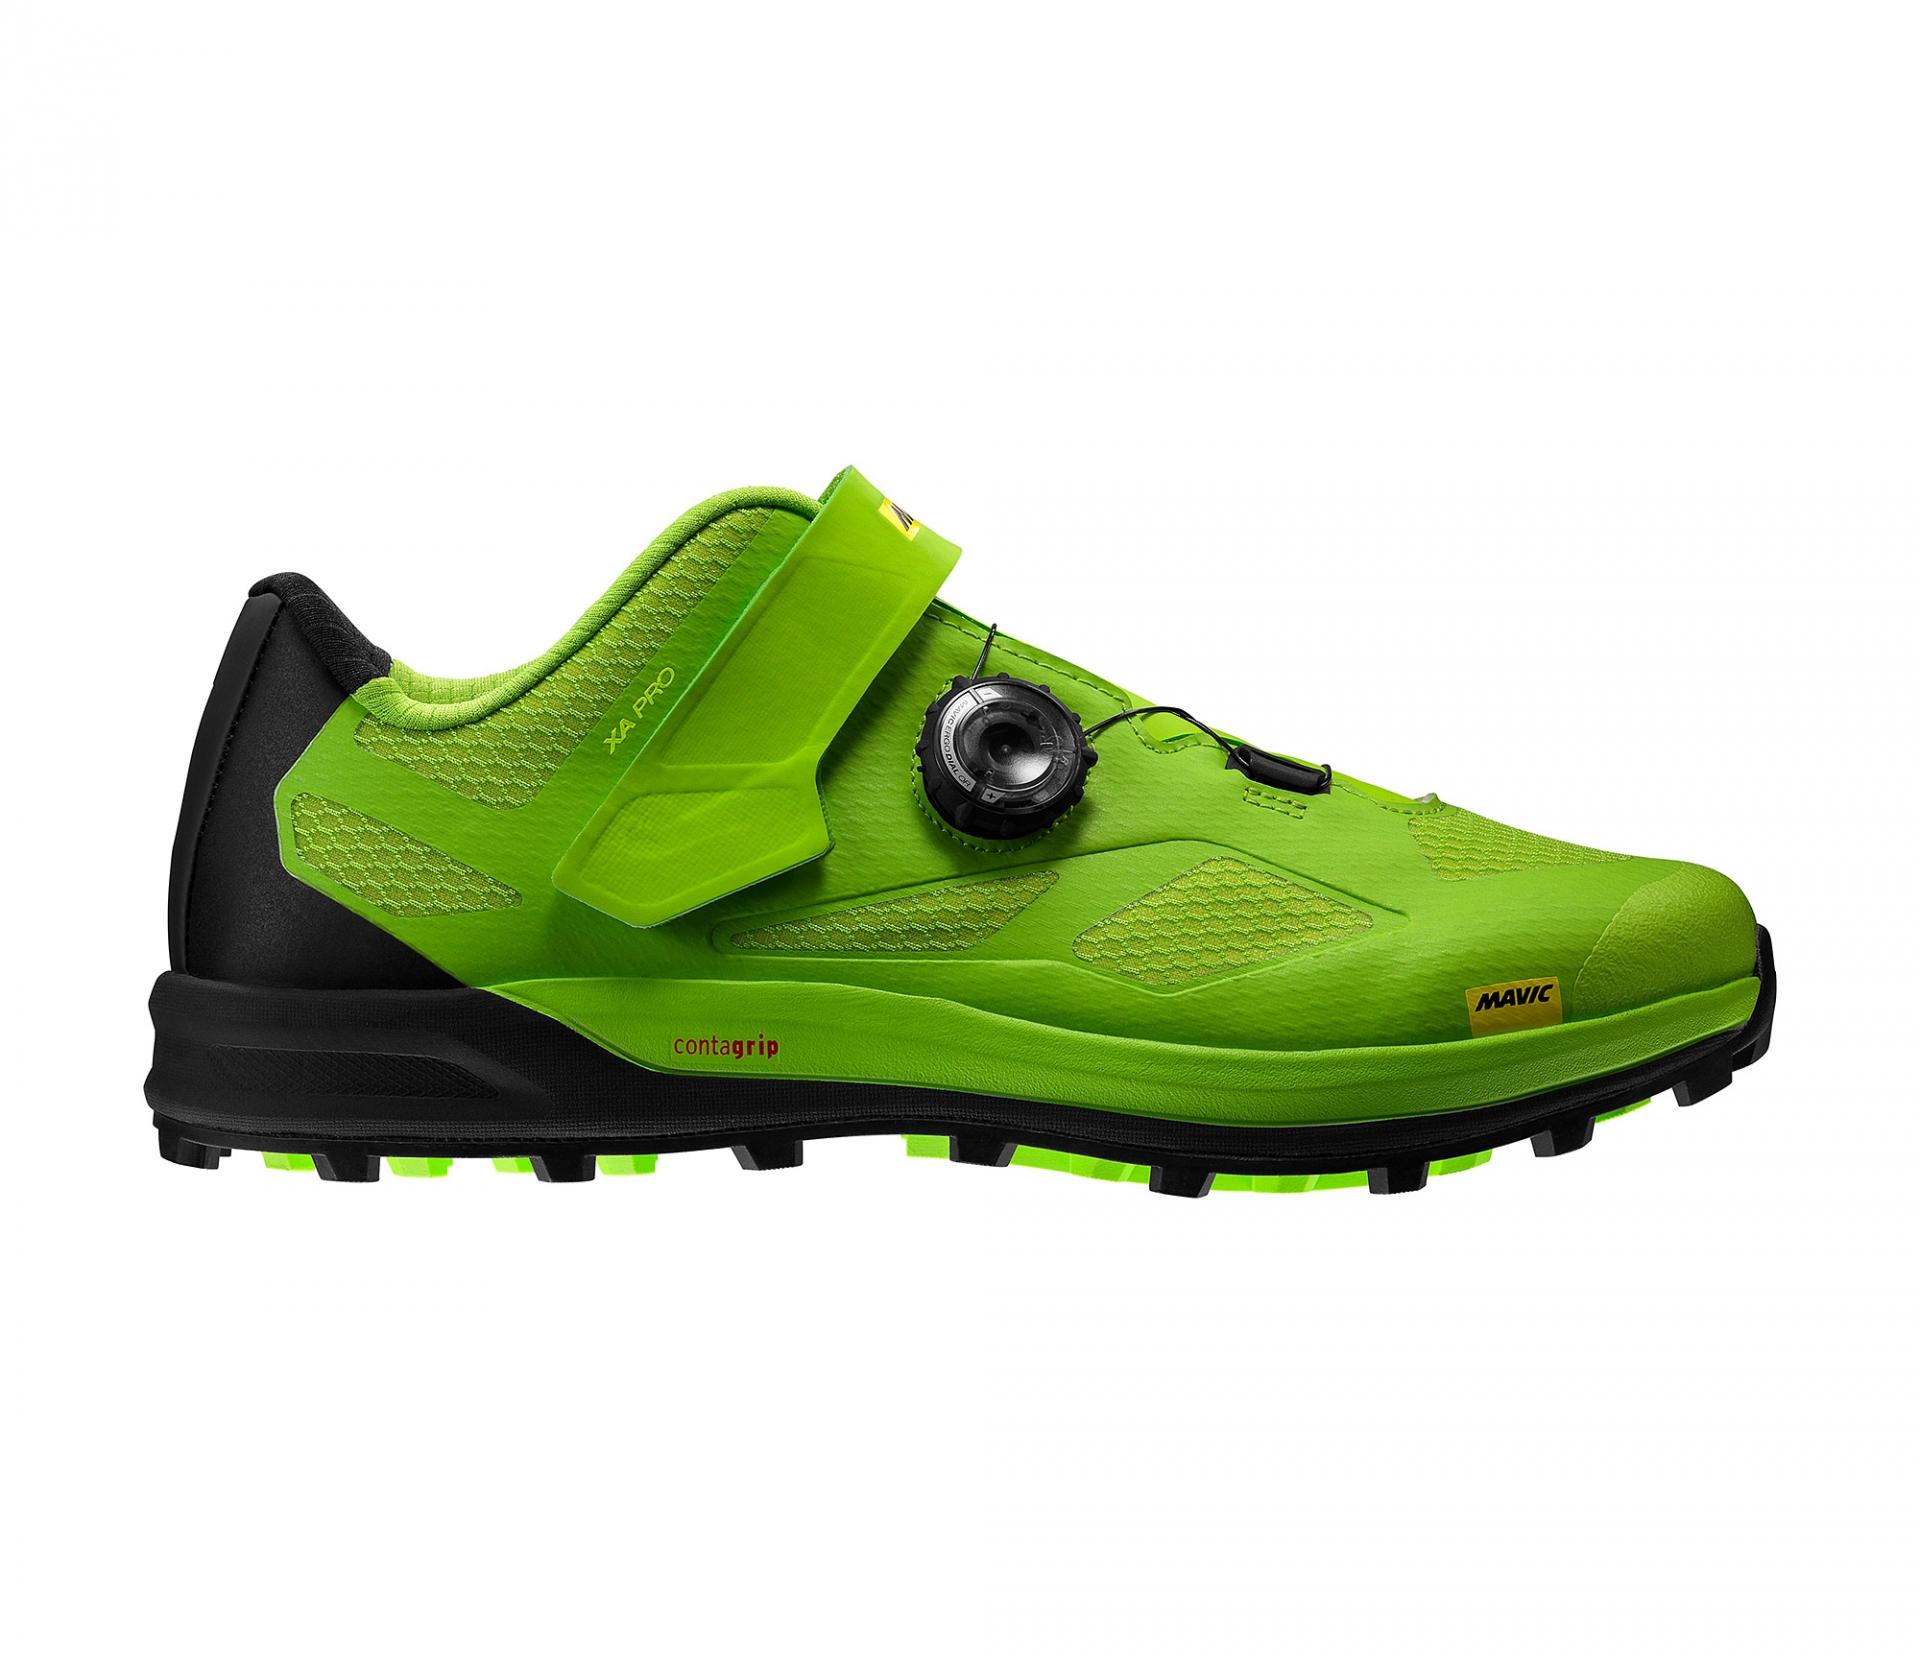 Chaussures VTT Mavic XA Pro Noir/Jaune - 42 2/3